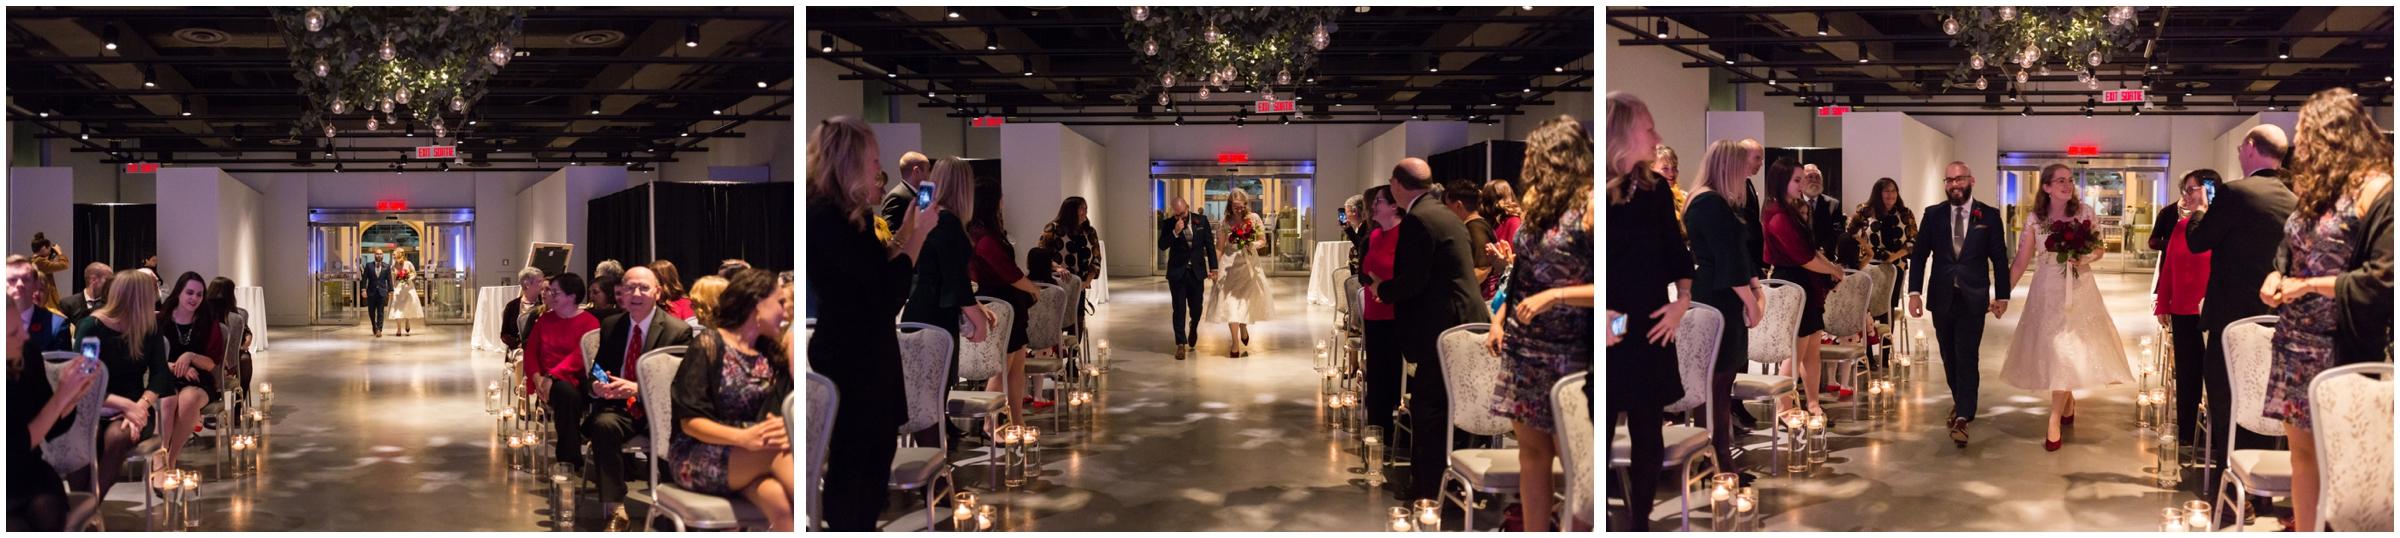 Ottaw Wedding Allison Andrew - (Selena Phillips-Boyle)_0068.jpg